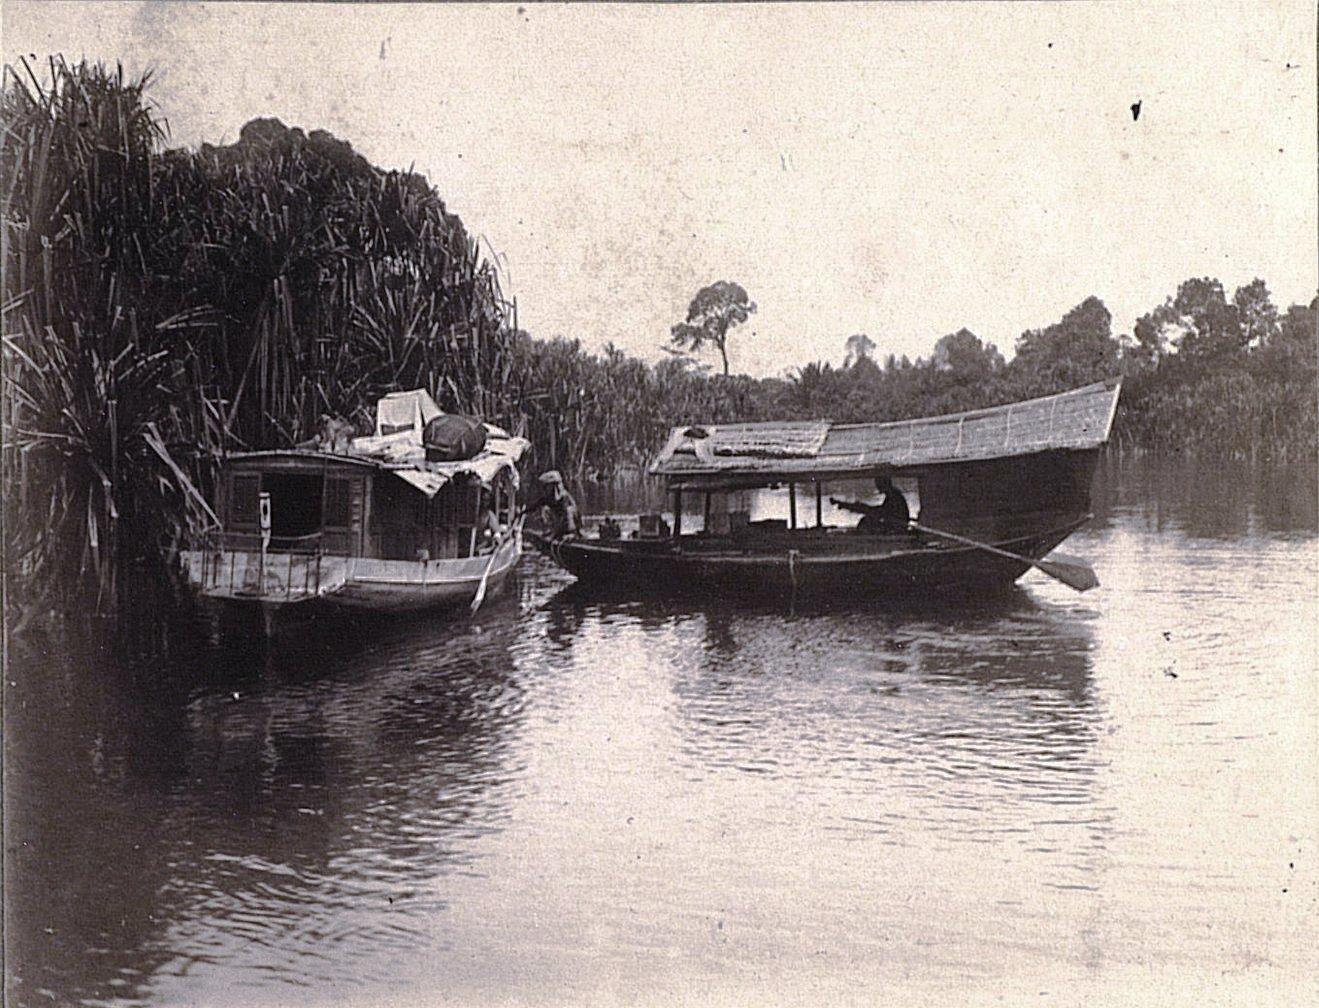 Лодка китайского торговца. Суматра